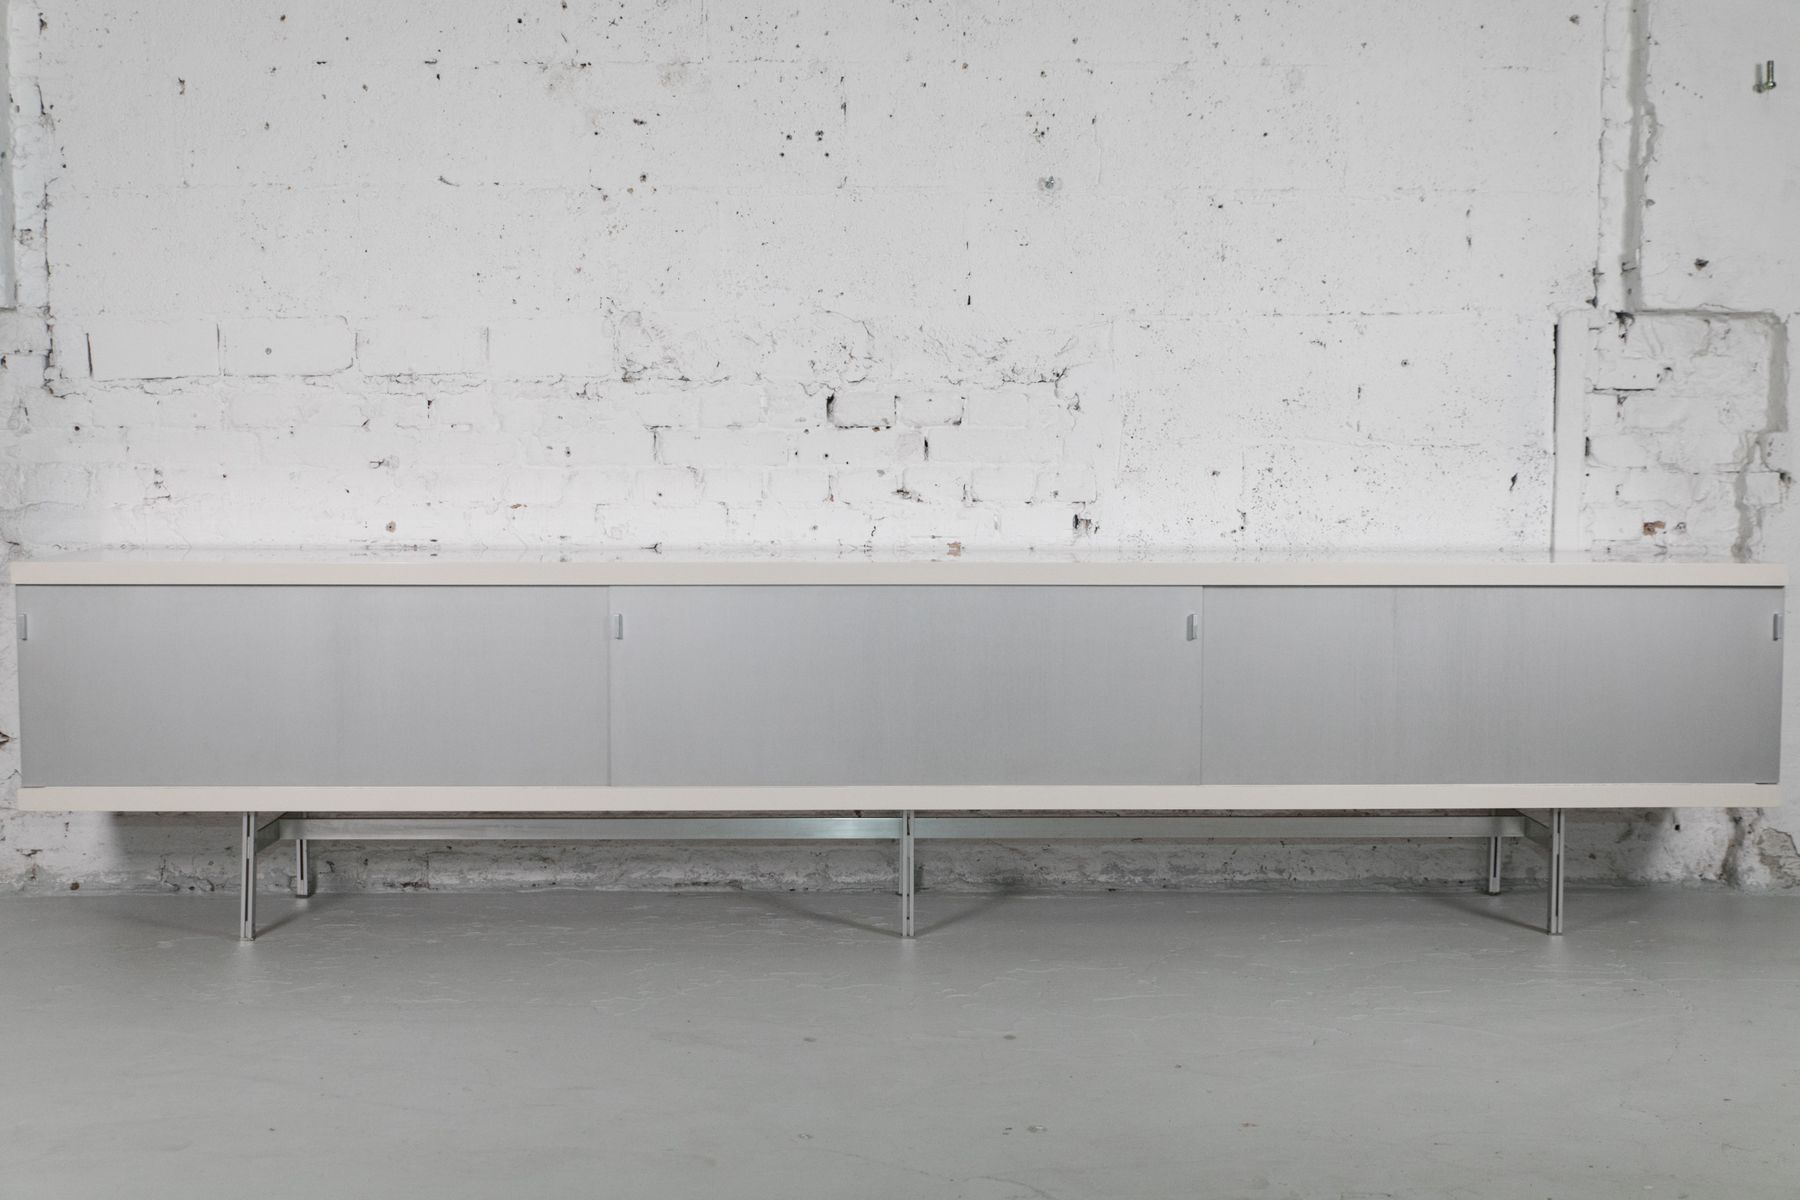 Modell 1730 Sideboard von Horst Brüning für Behr Production KG, 1960er